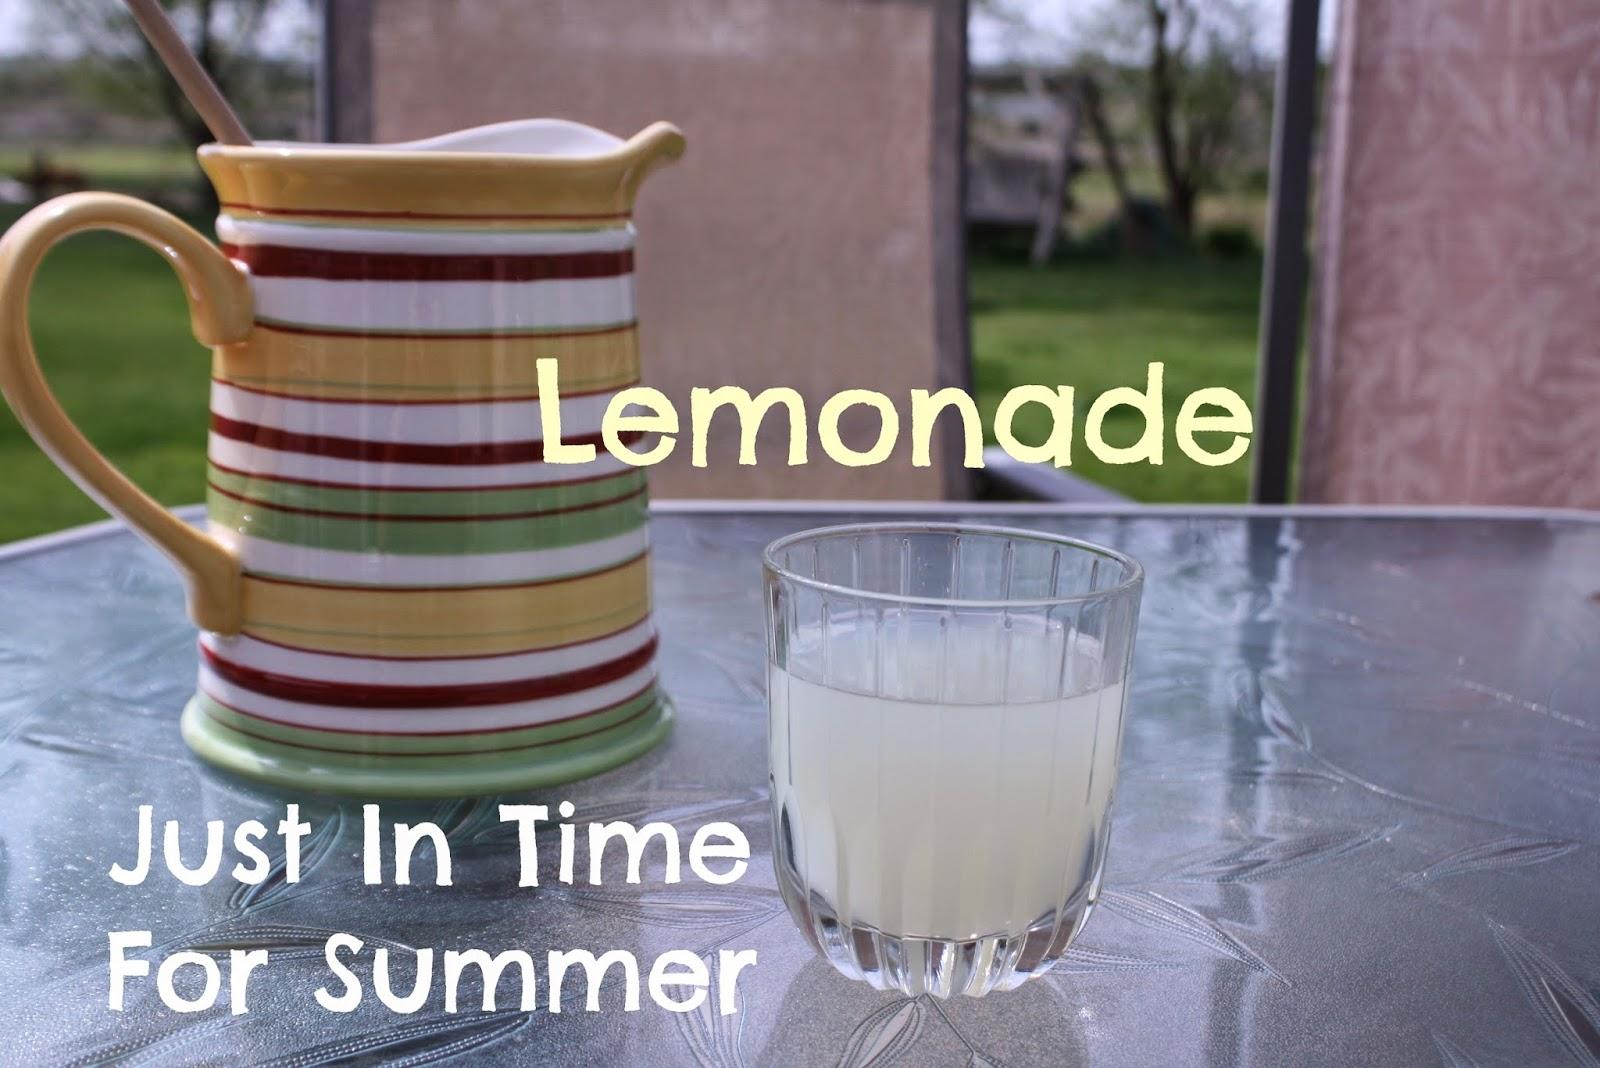 http://myjourneyforhim.blogspot.com/p/lemonade.html